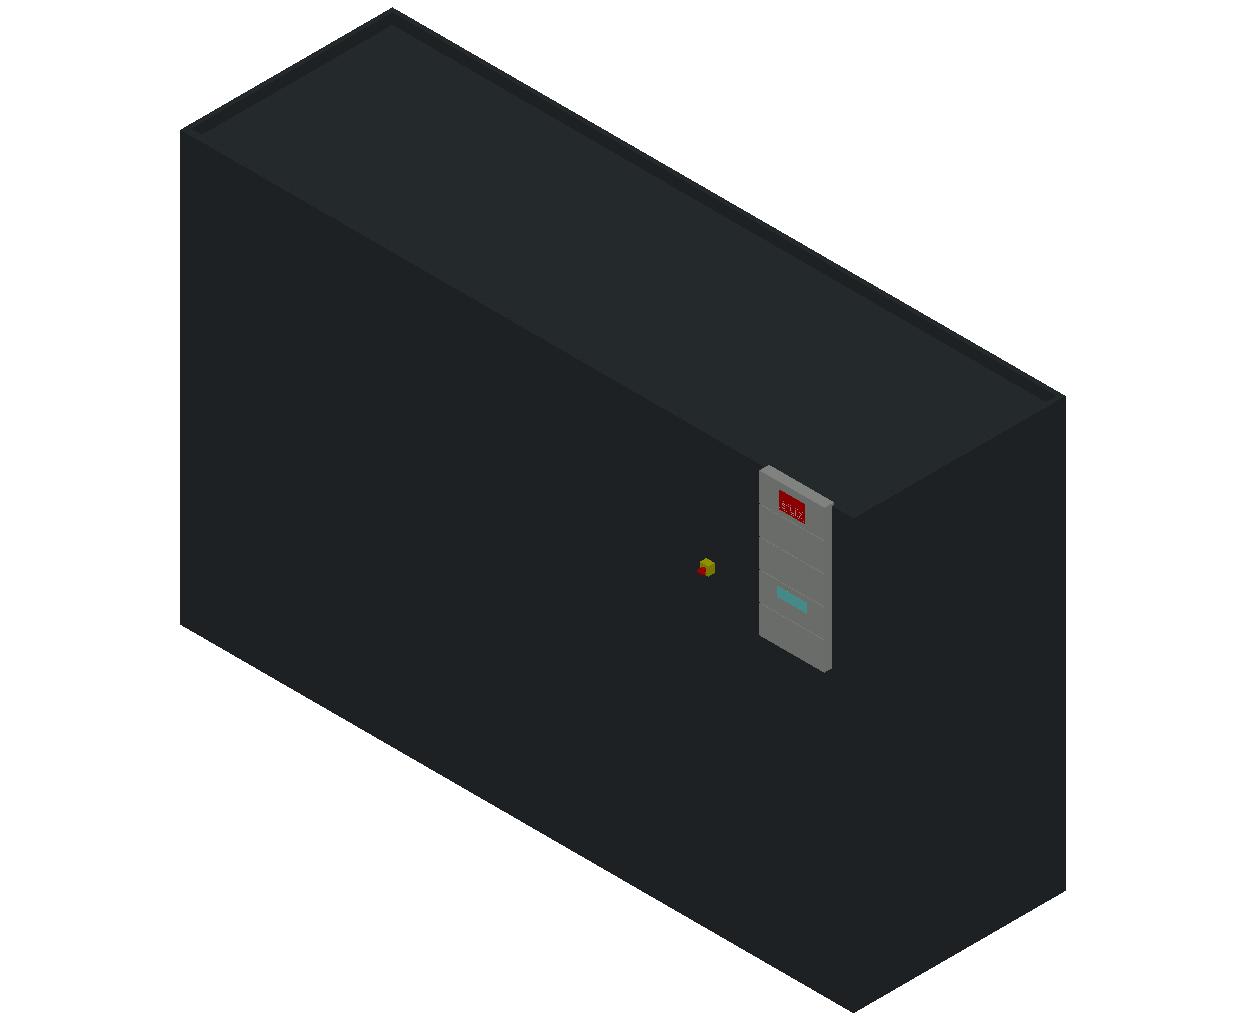 HC_Air Conditioner_Indoor Unit_MEPcontent_STULZ_CyberAir 3PRO_ALD_Dual Circuit GE_ALD_1152_GE_INT-EN.dwg